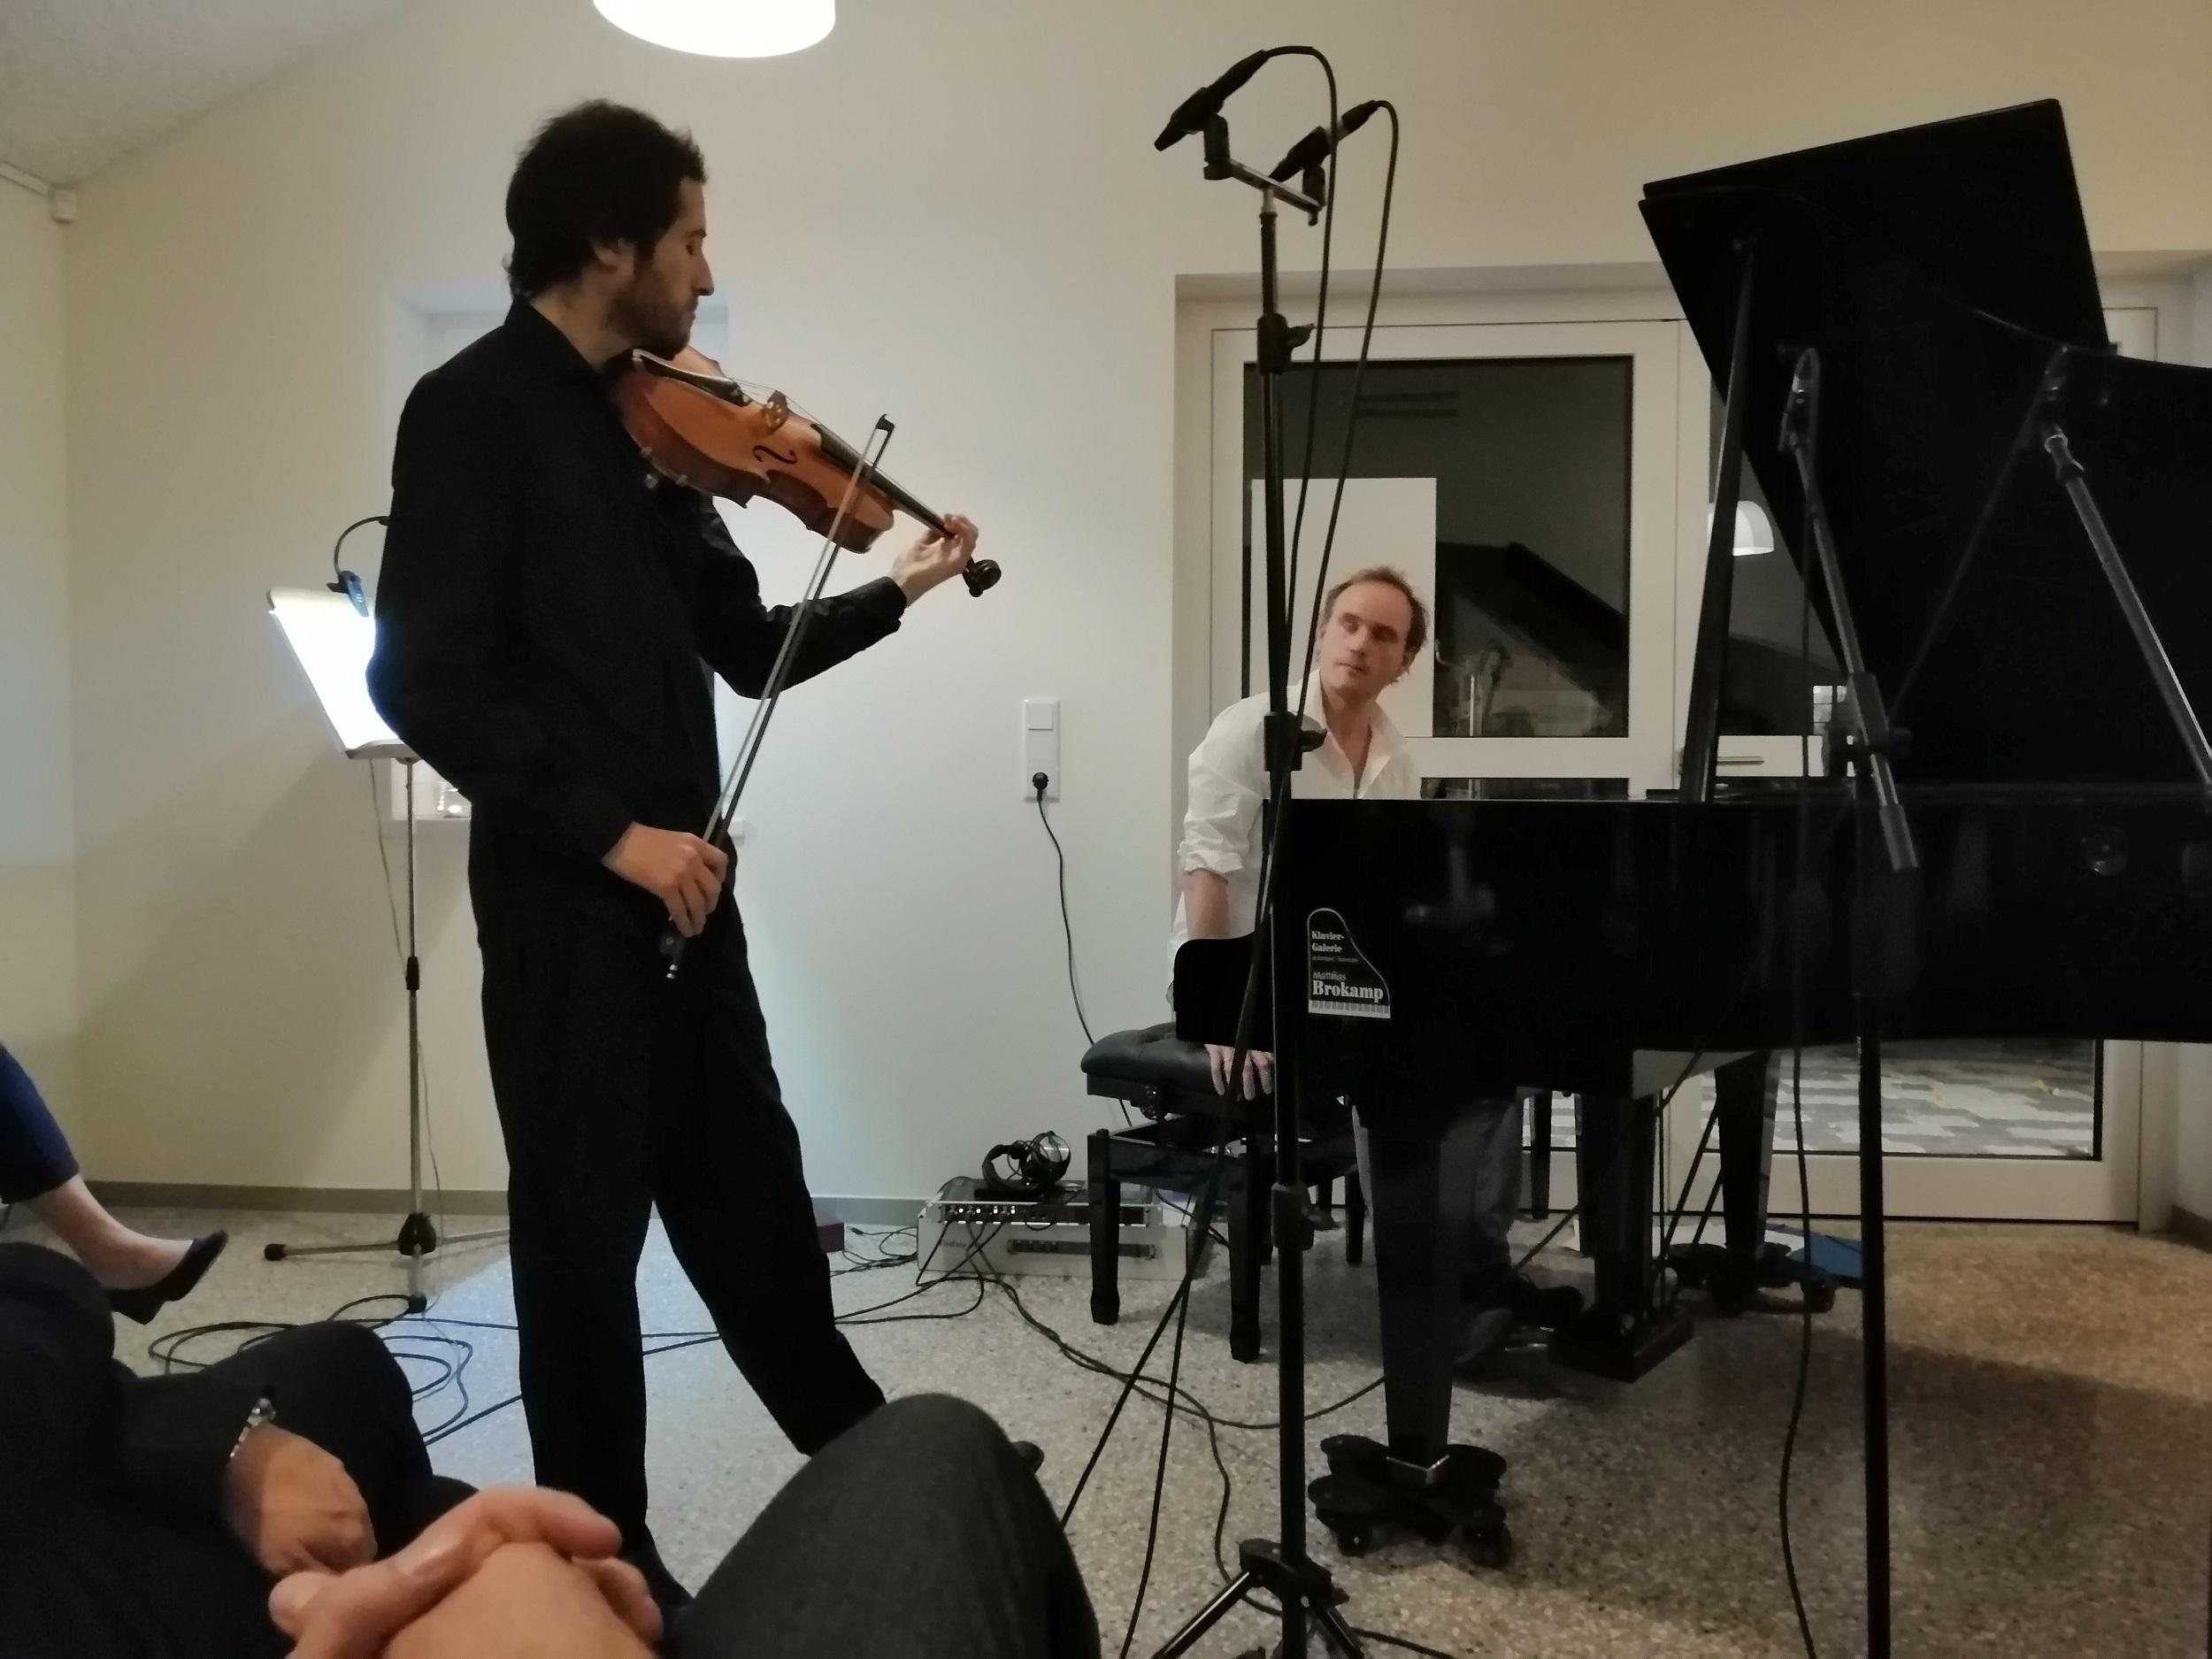 2019 11 03 Klavierkonzert 3